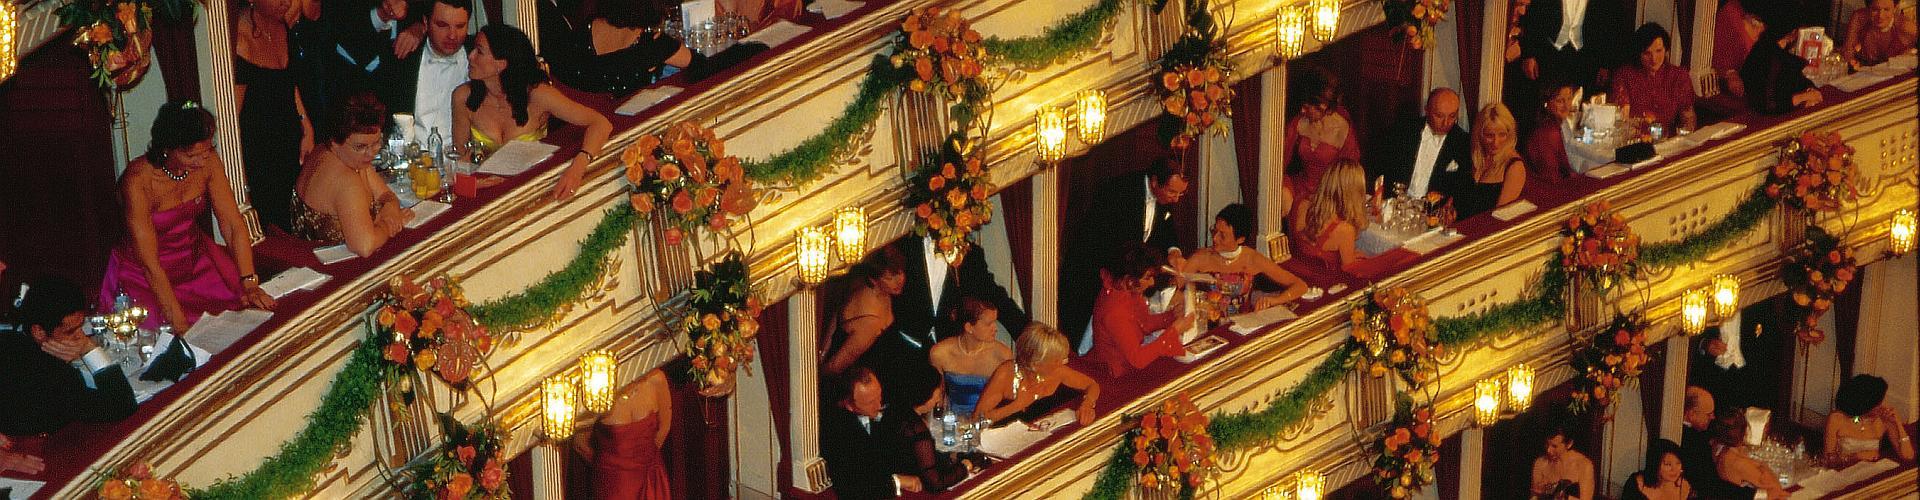 Eintrittskarten Wiener Oper